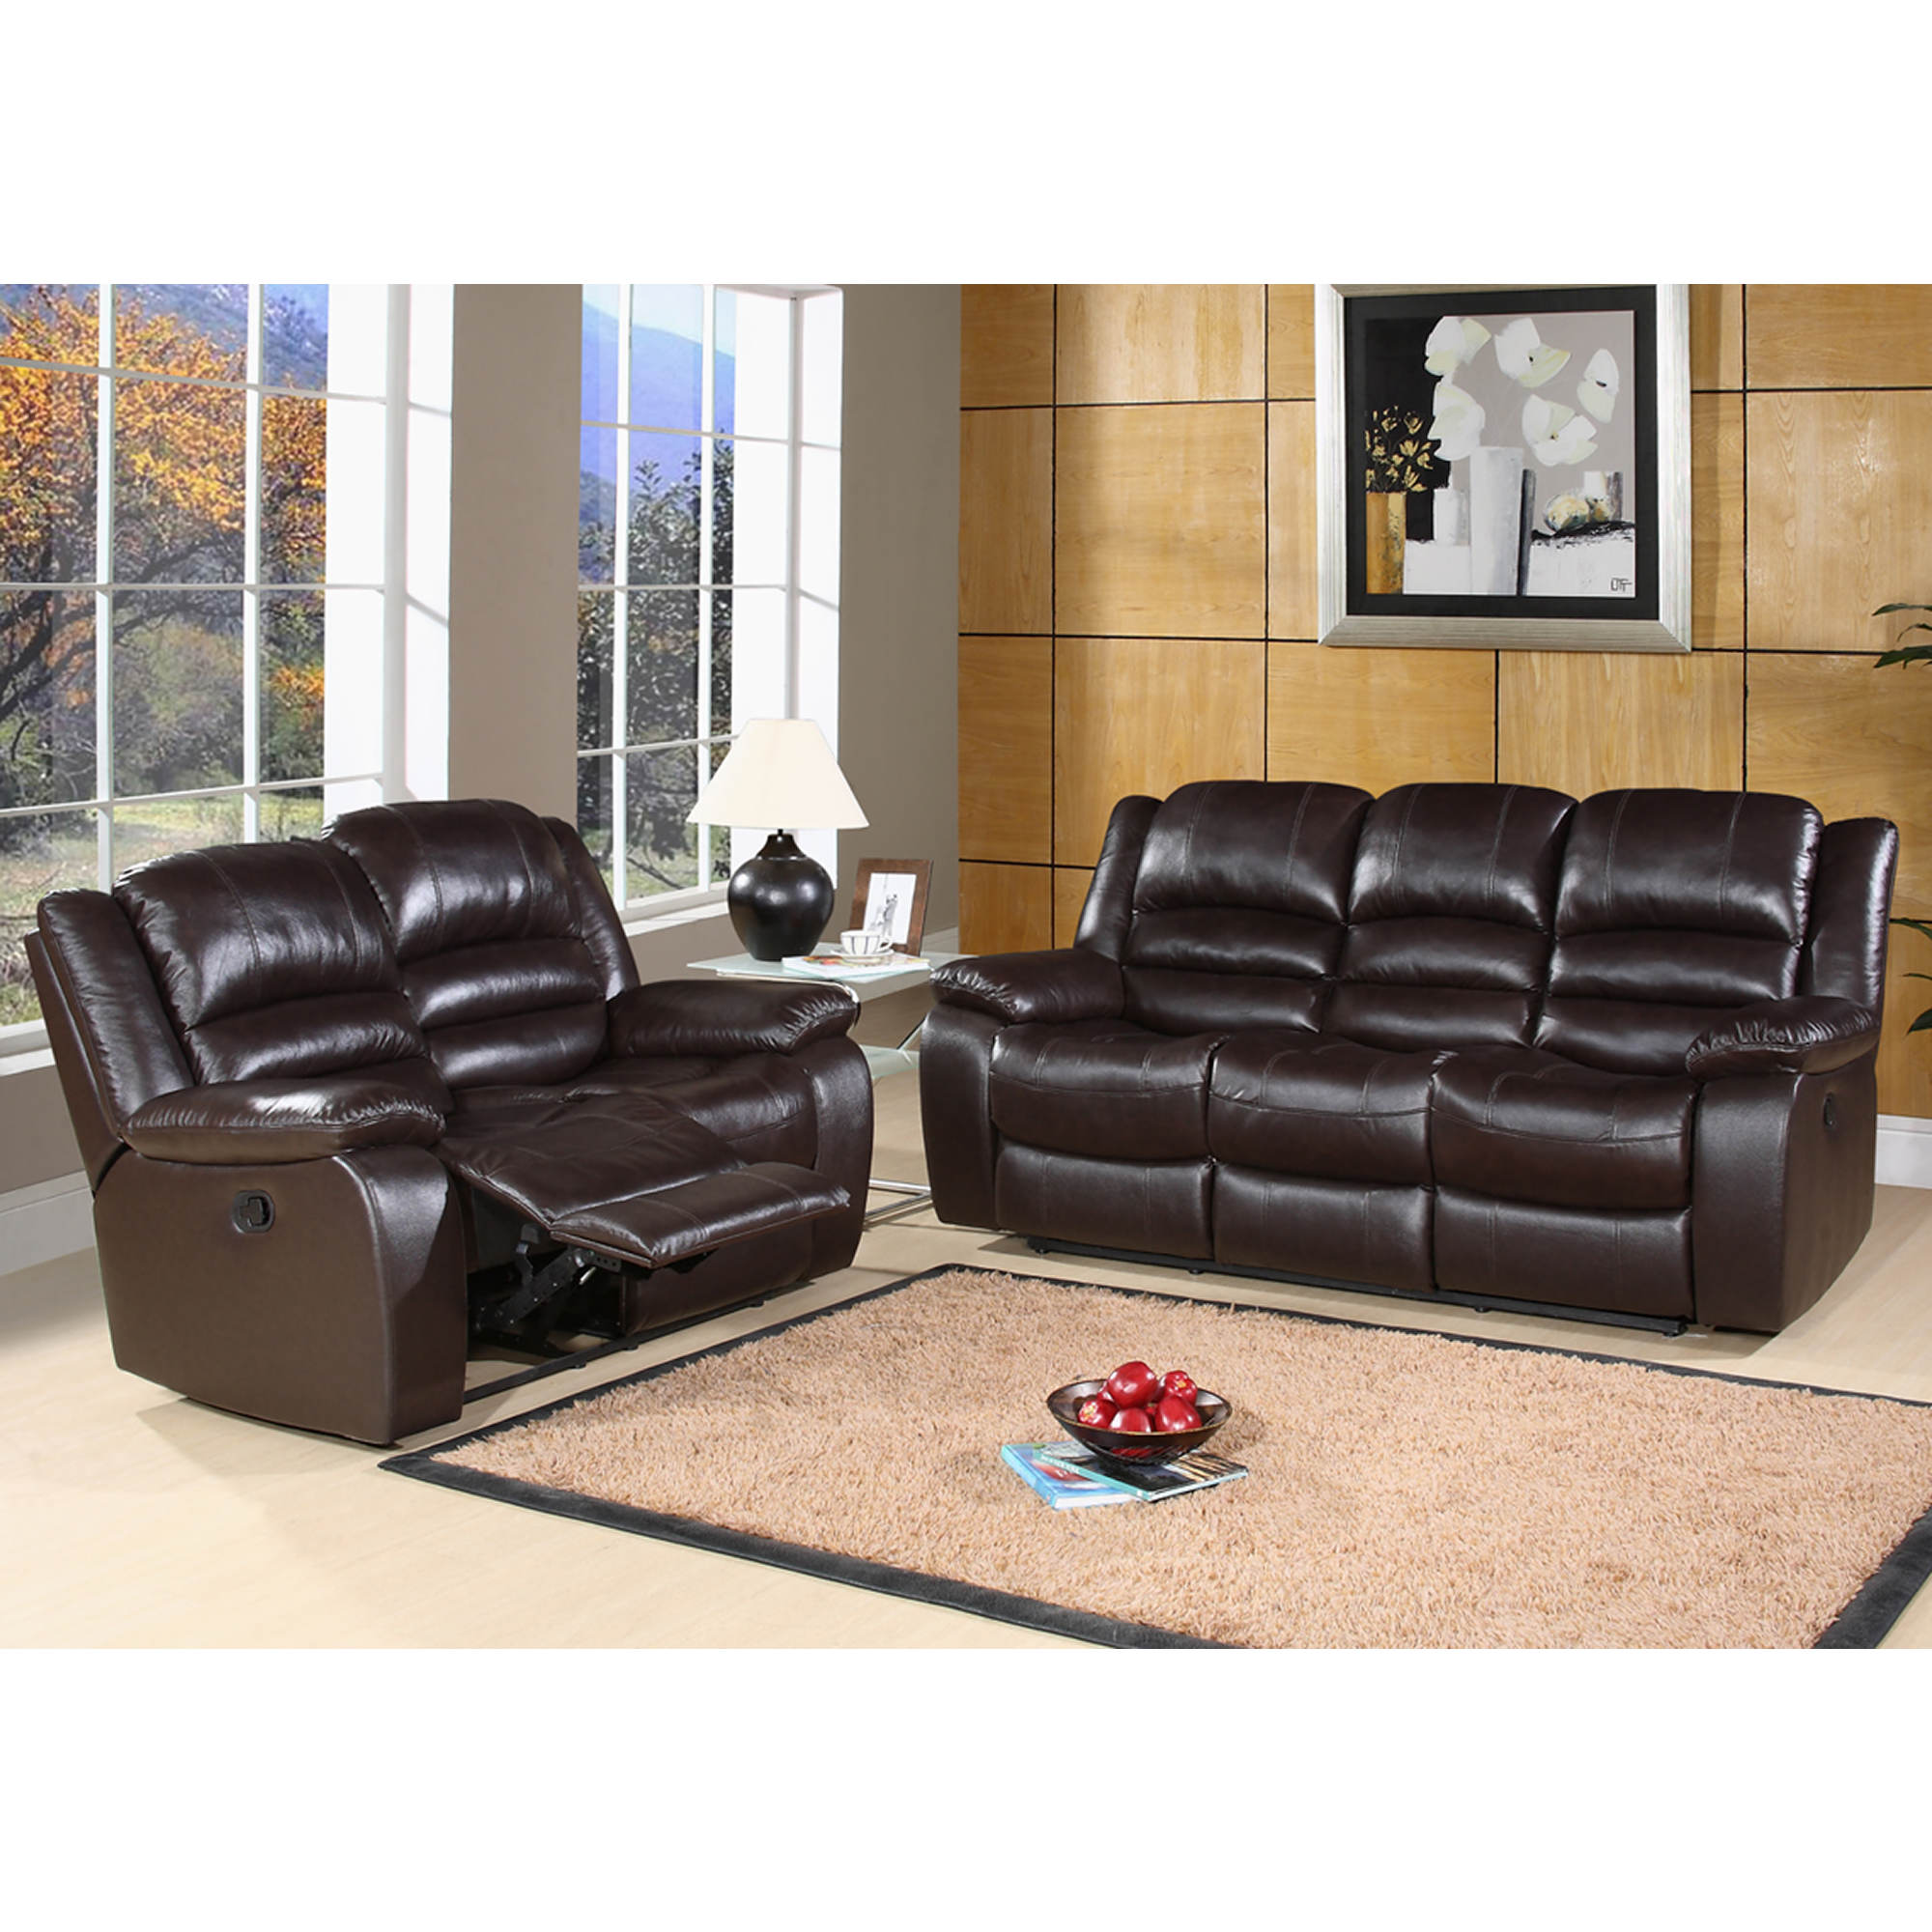 Abbyson Living Cayman 2-Pc. Top-Grain Italian Leather